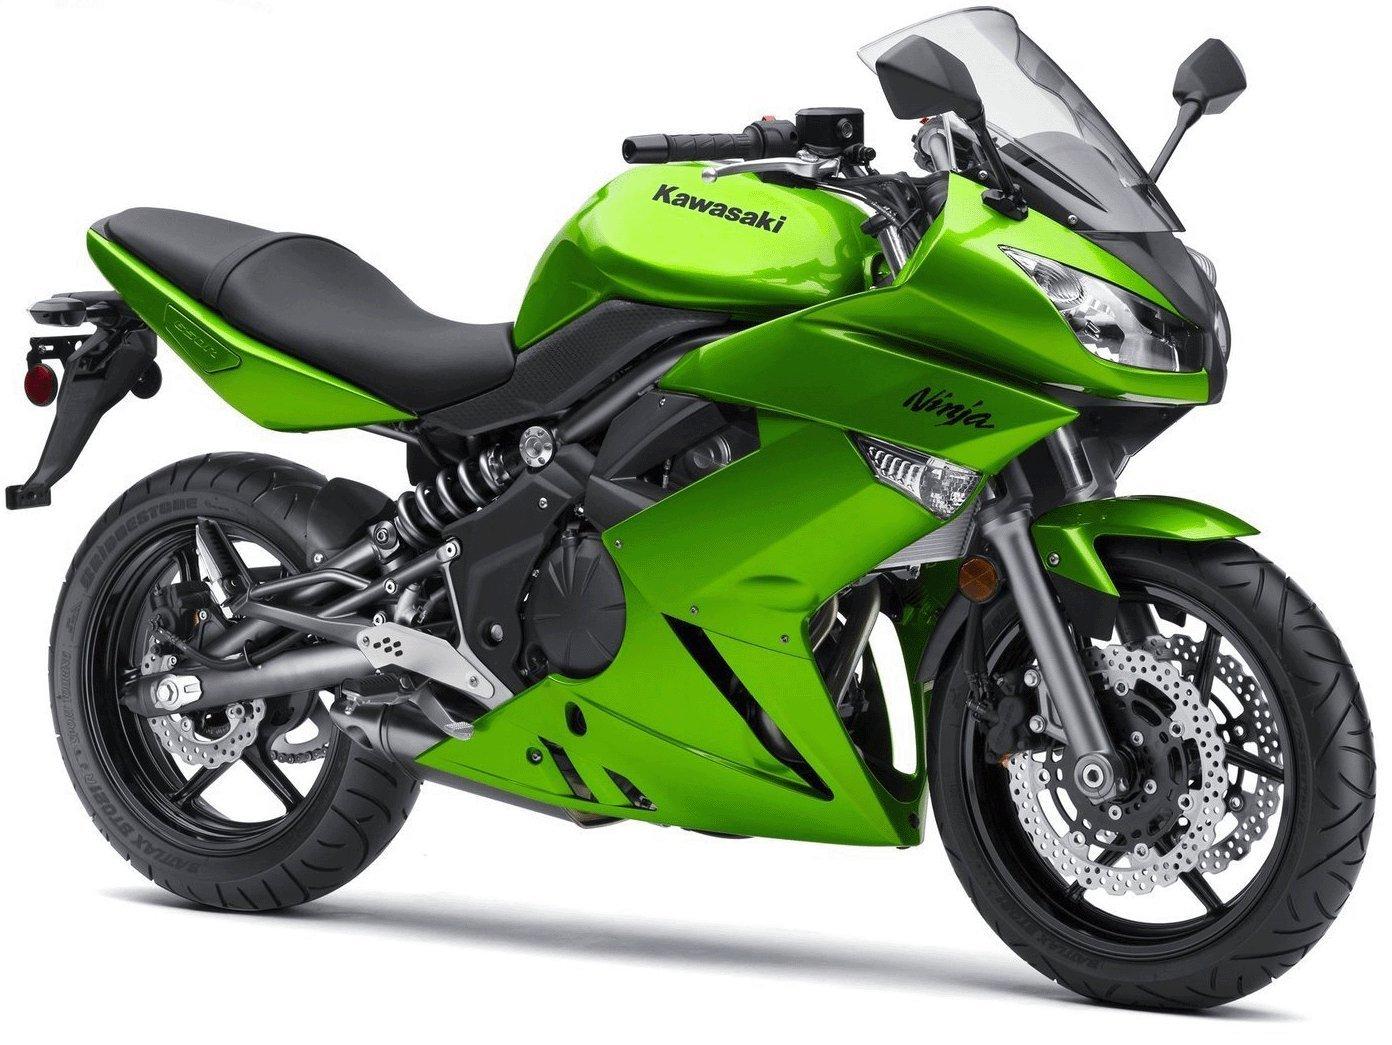 Amazon.com: 2008 – 2011 Kawasaki Ninja 650 manubrio extremo ...